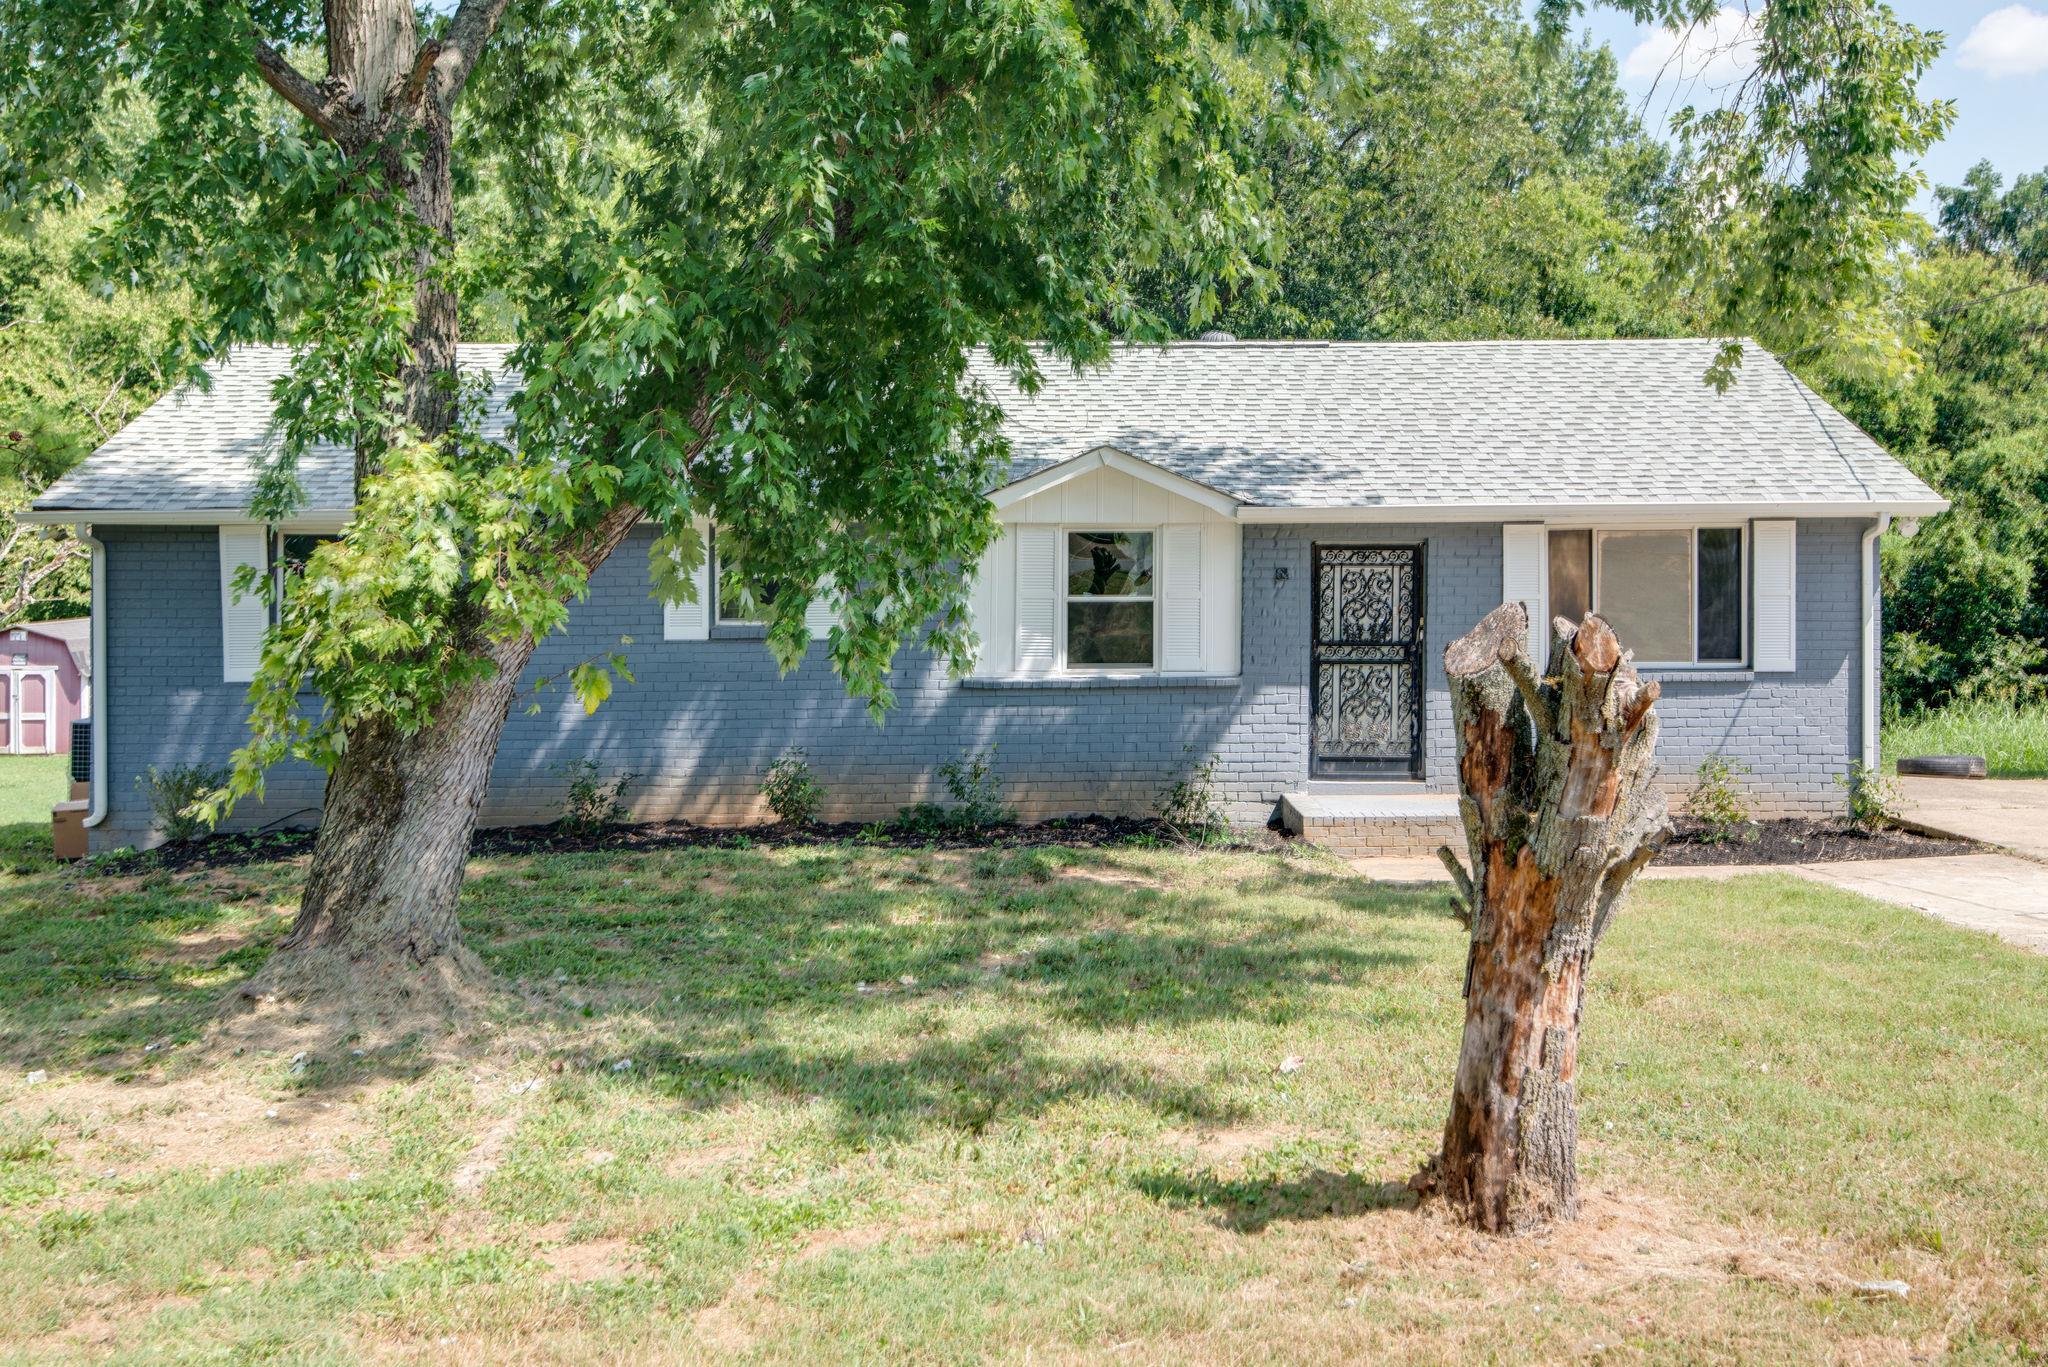 537 Phipps Dr, Nashville, TN 37218 - Nashville, TN real estate listing